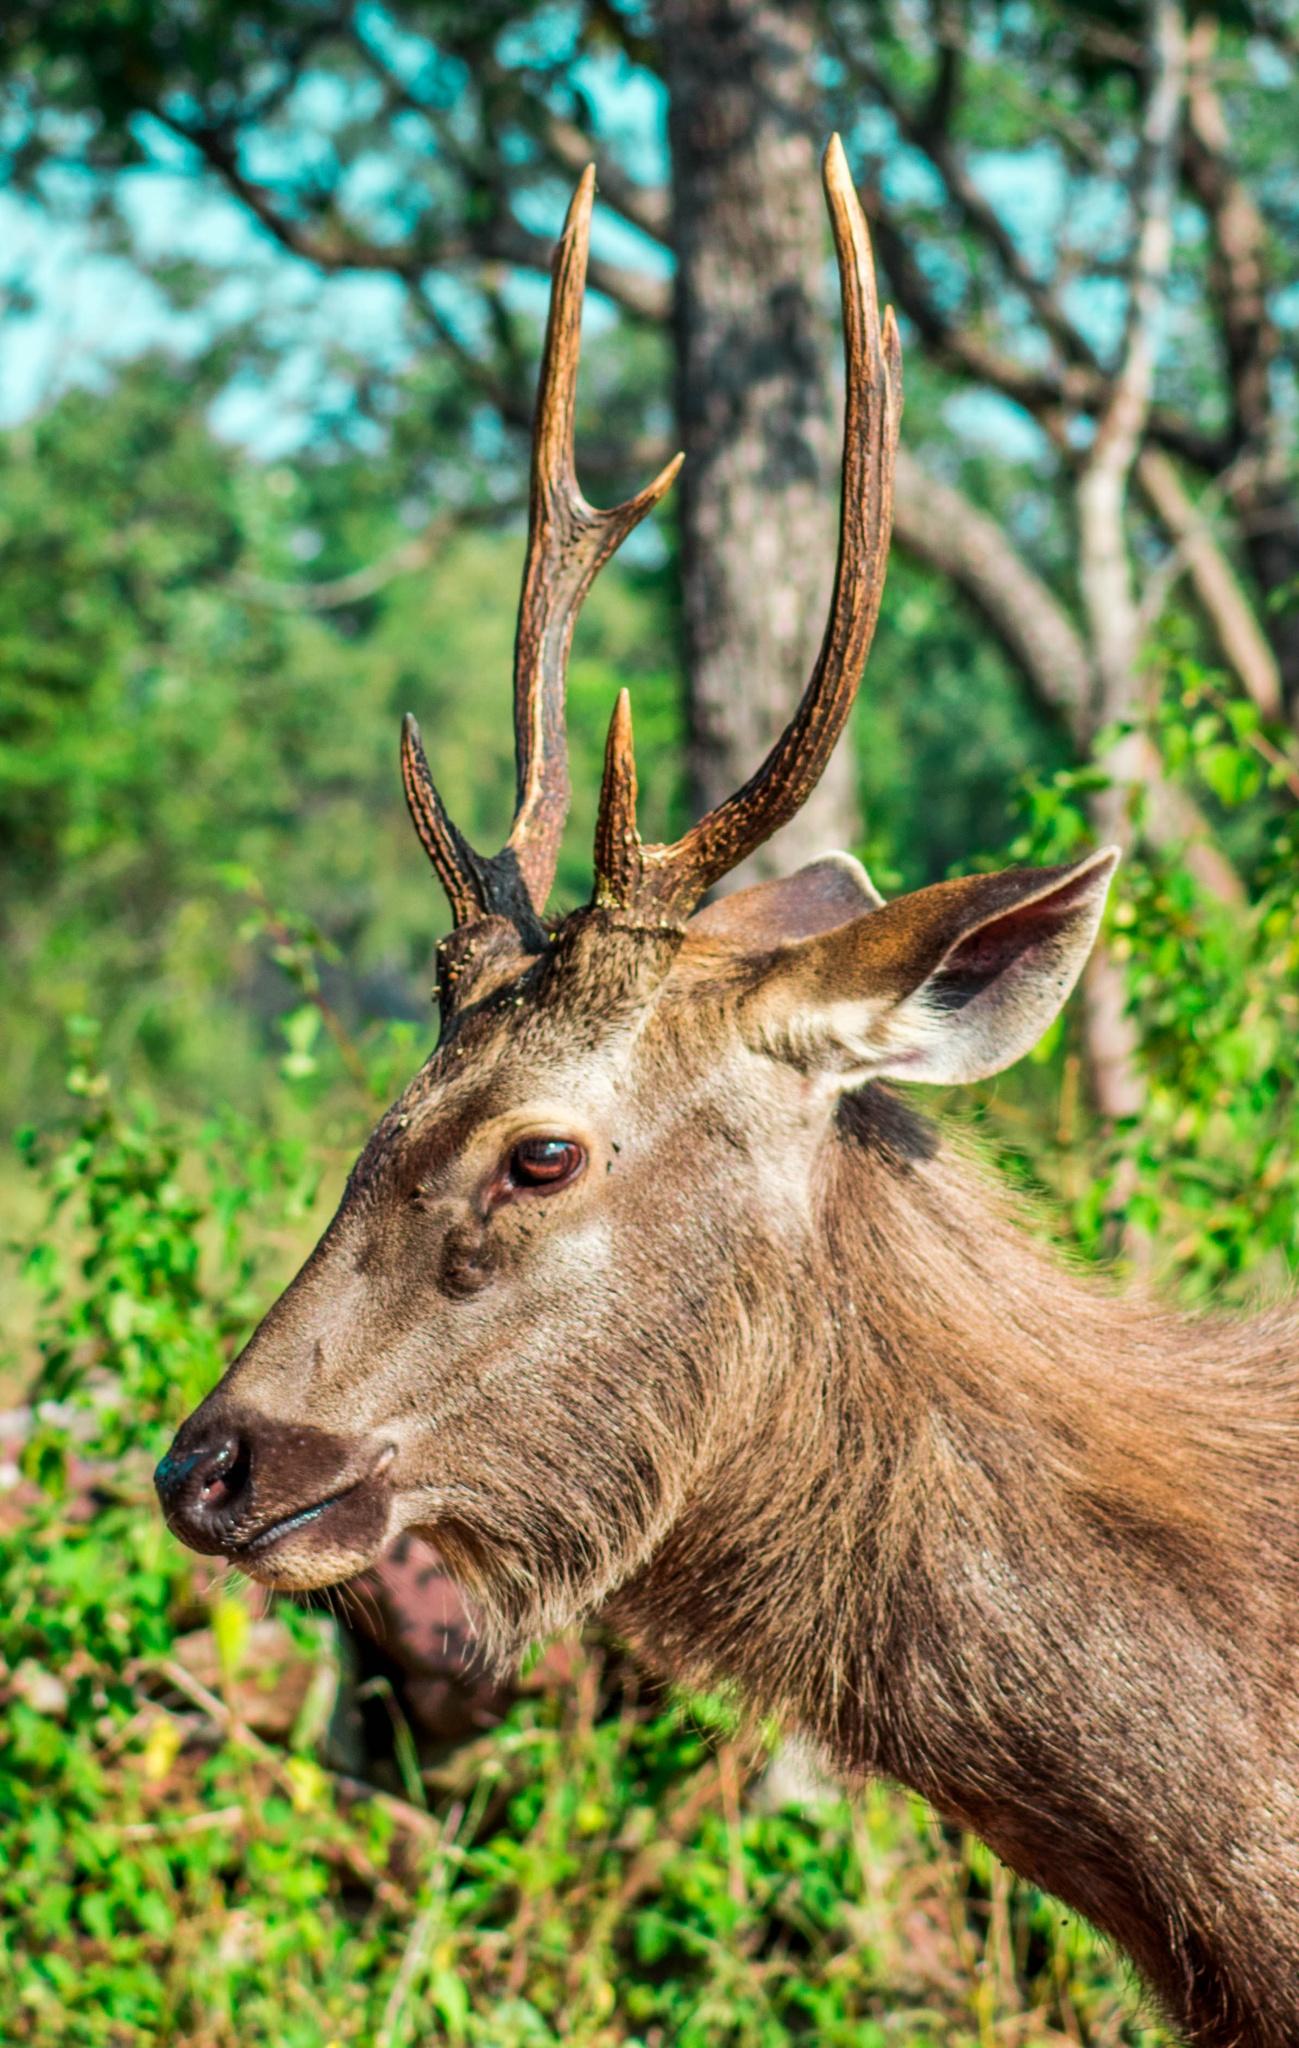 Sambar Deer by N. K. Teja